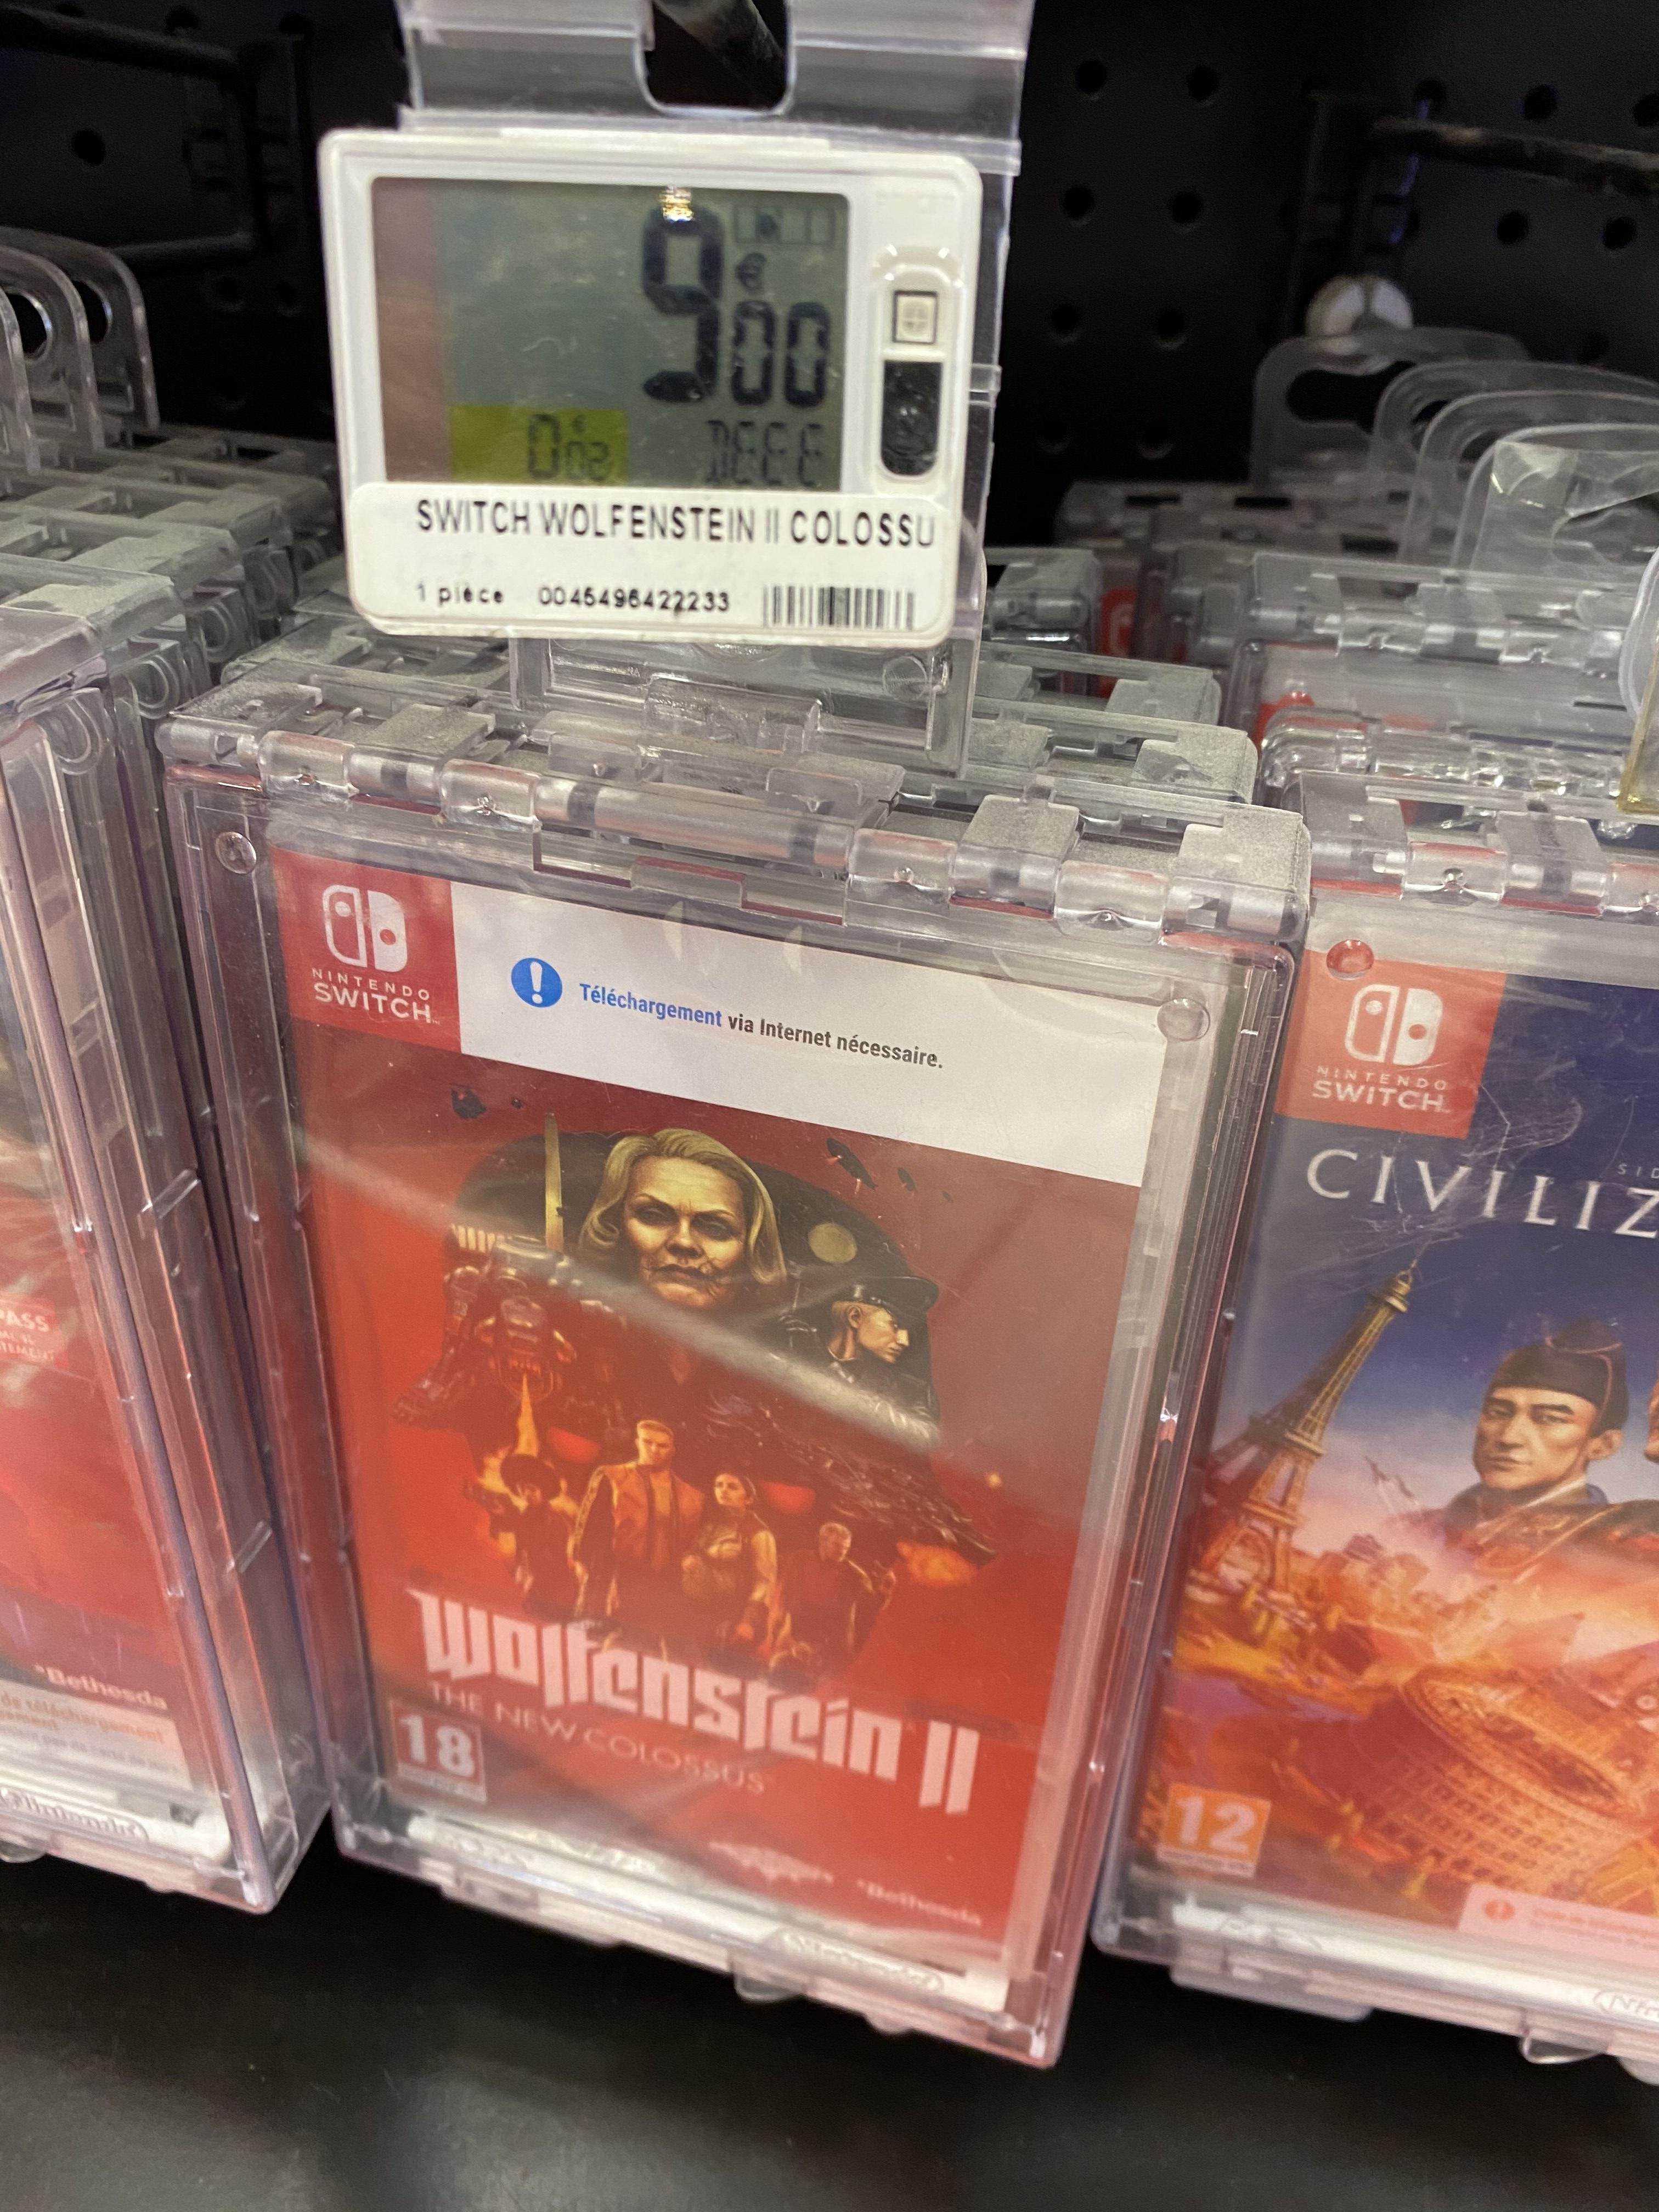 Wolfenstein II sur Nintendo Switch - Nice Lingostière (06)